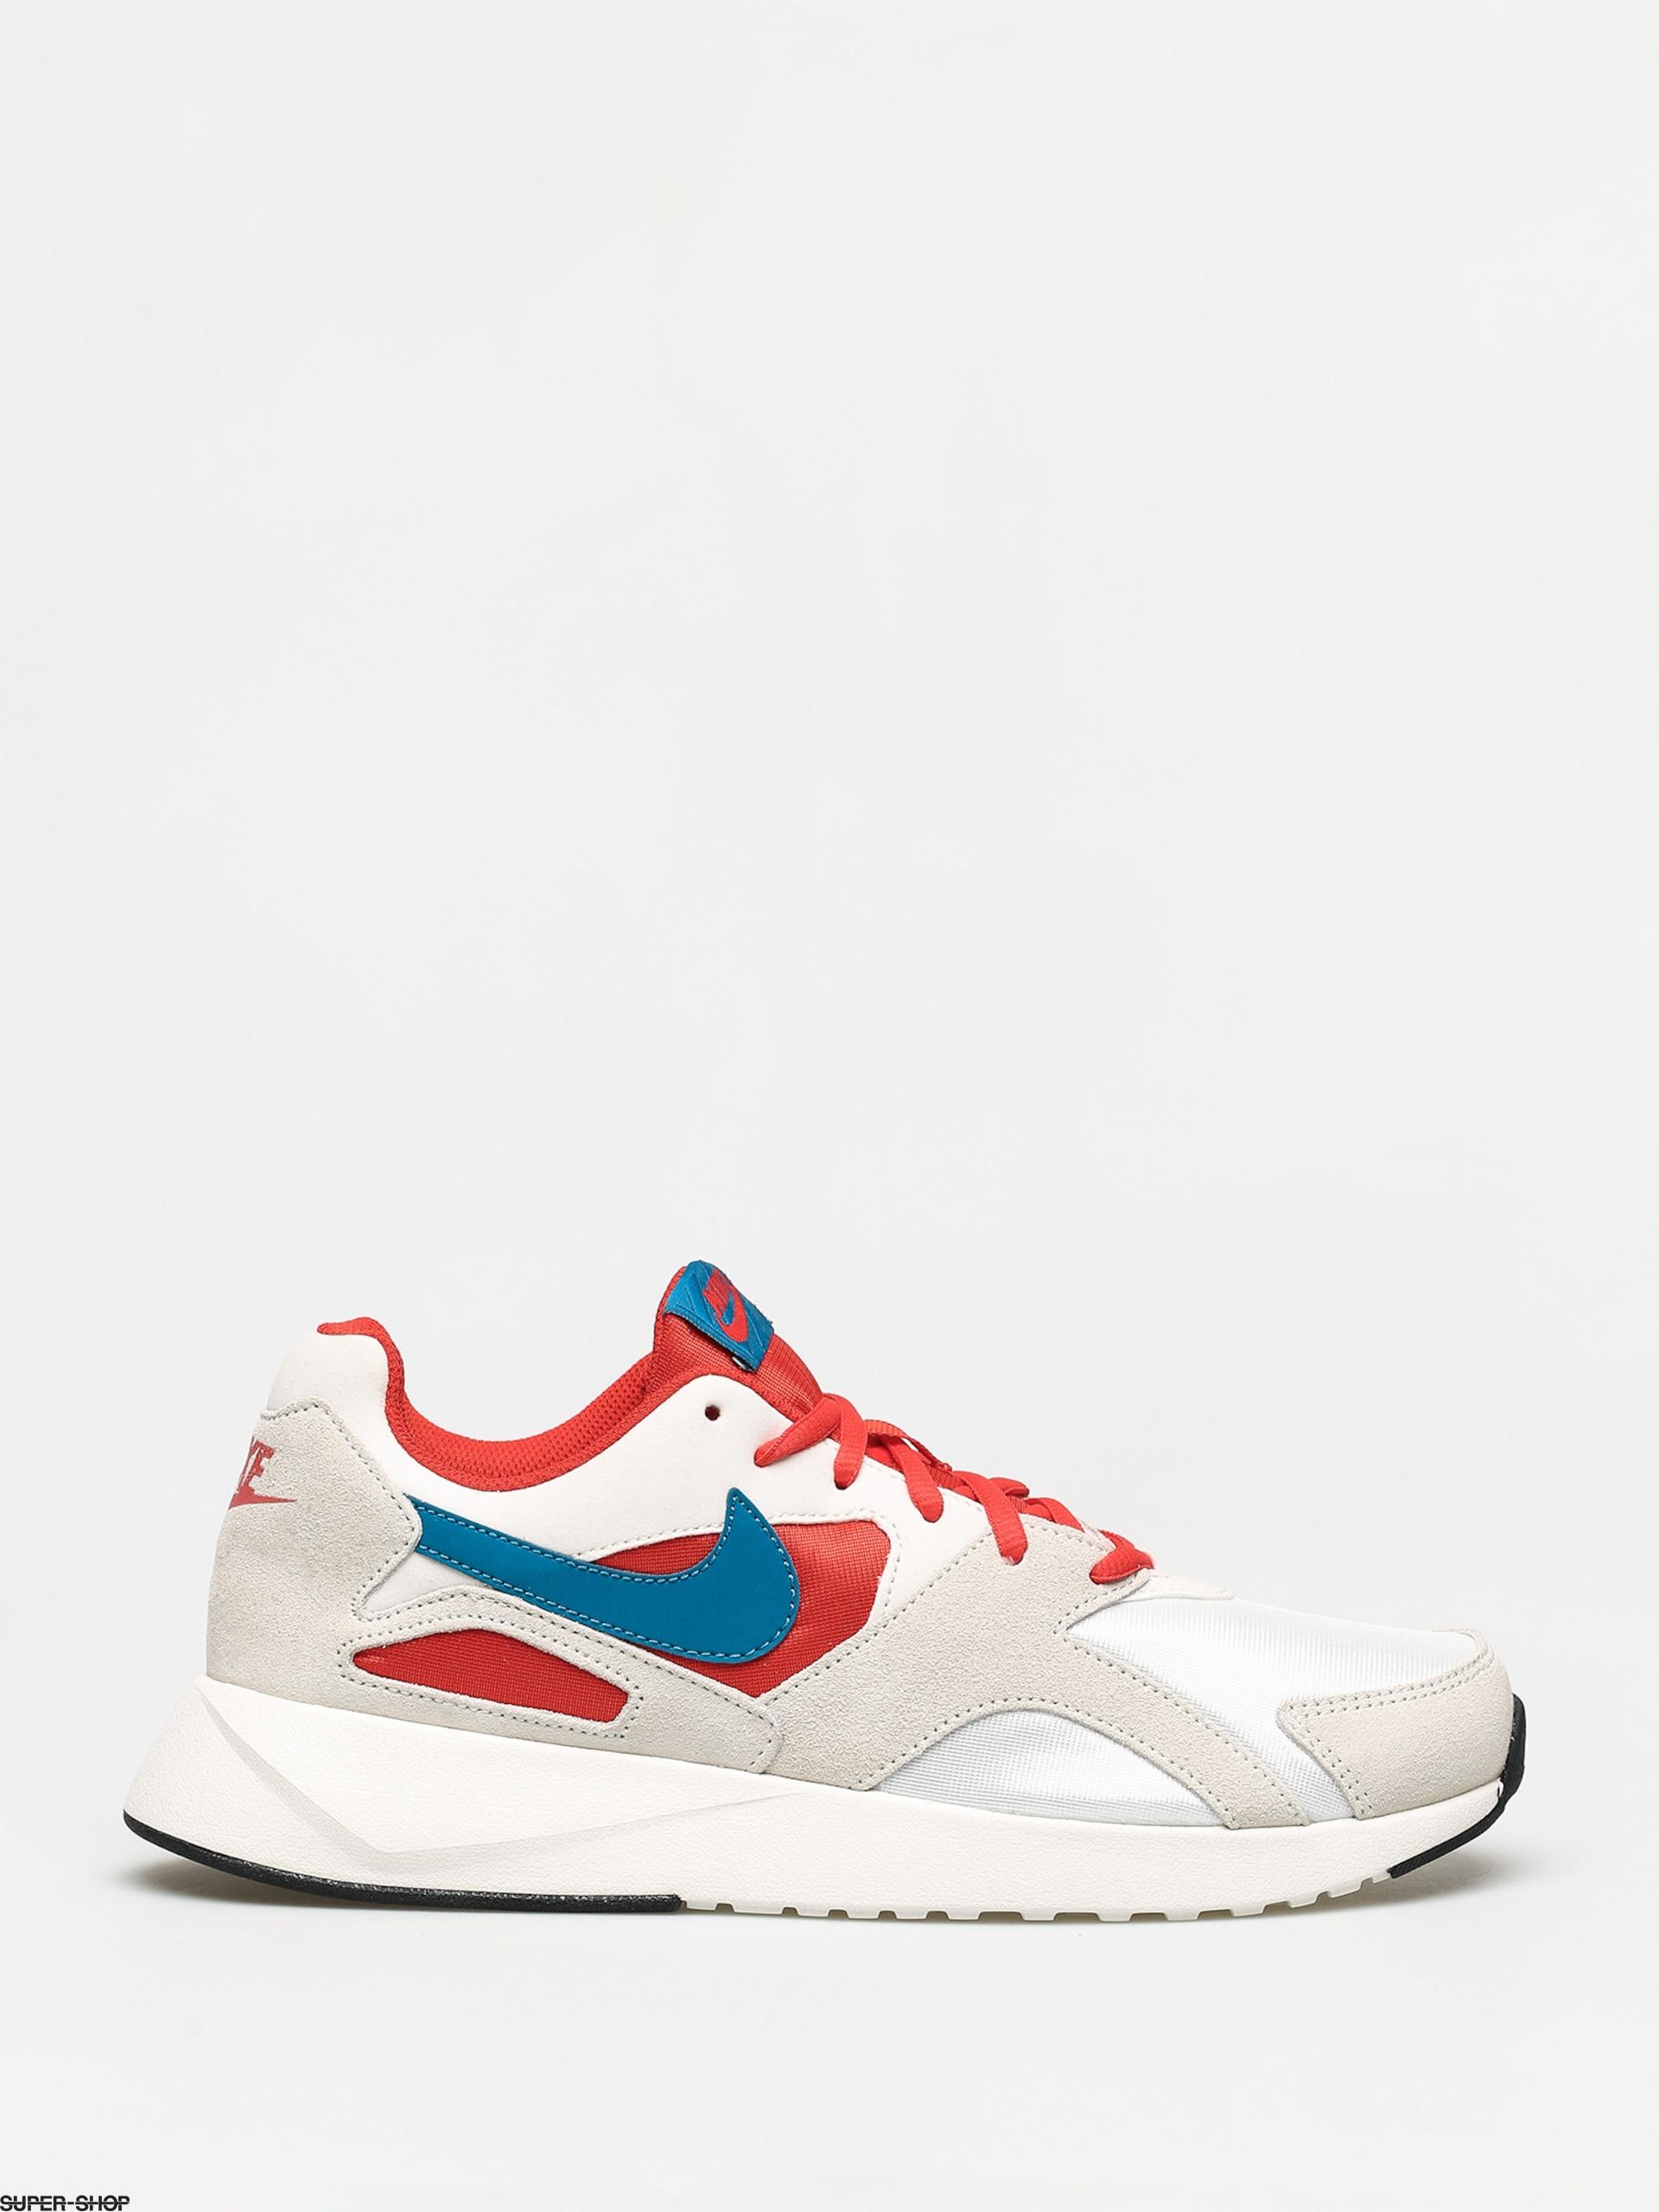 Corredor Circulo servir  Nike Pantheos Shoes (summit white/green abyss habanero red)